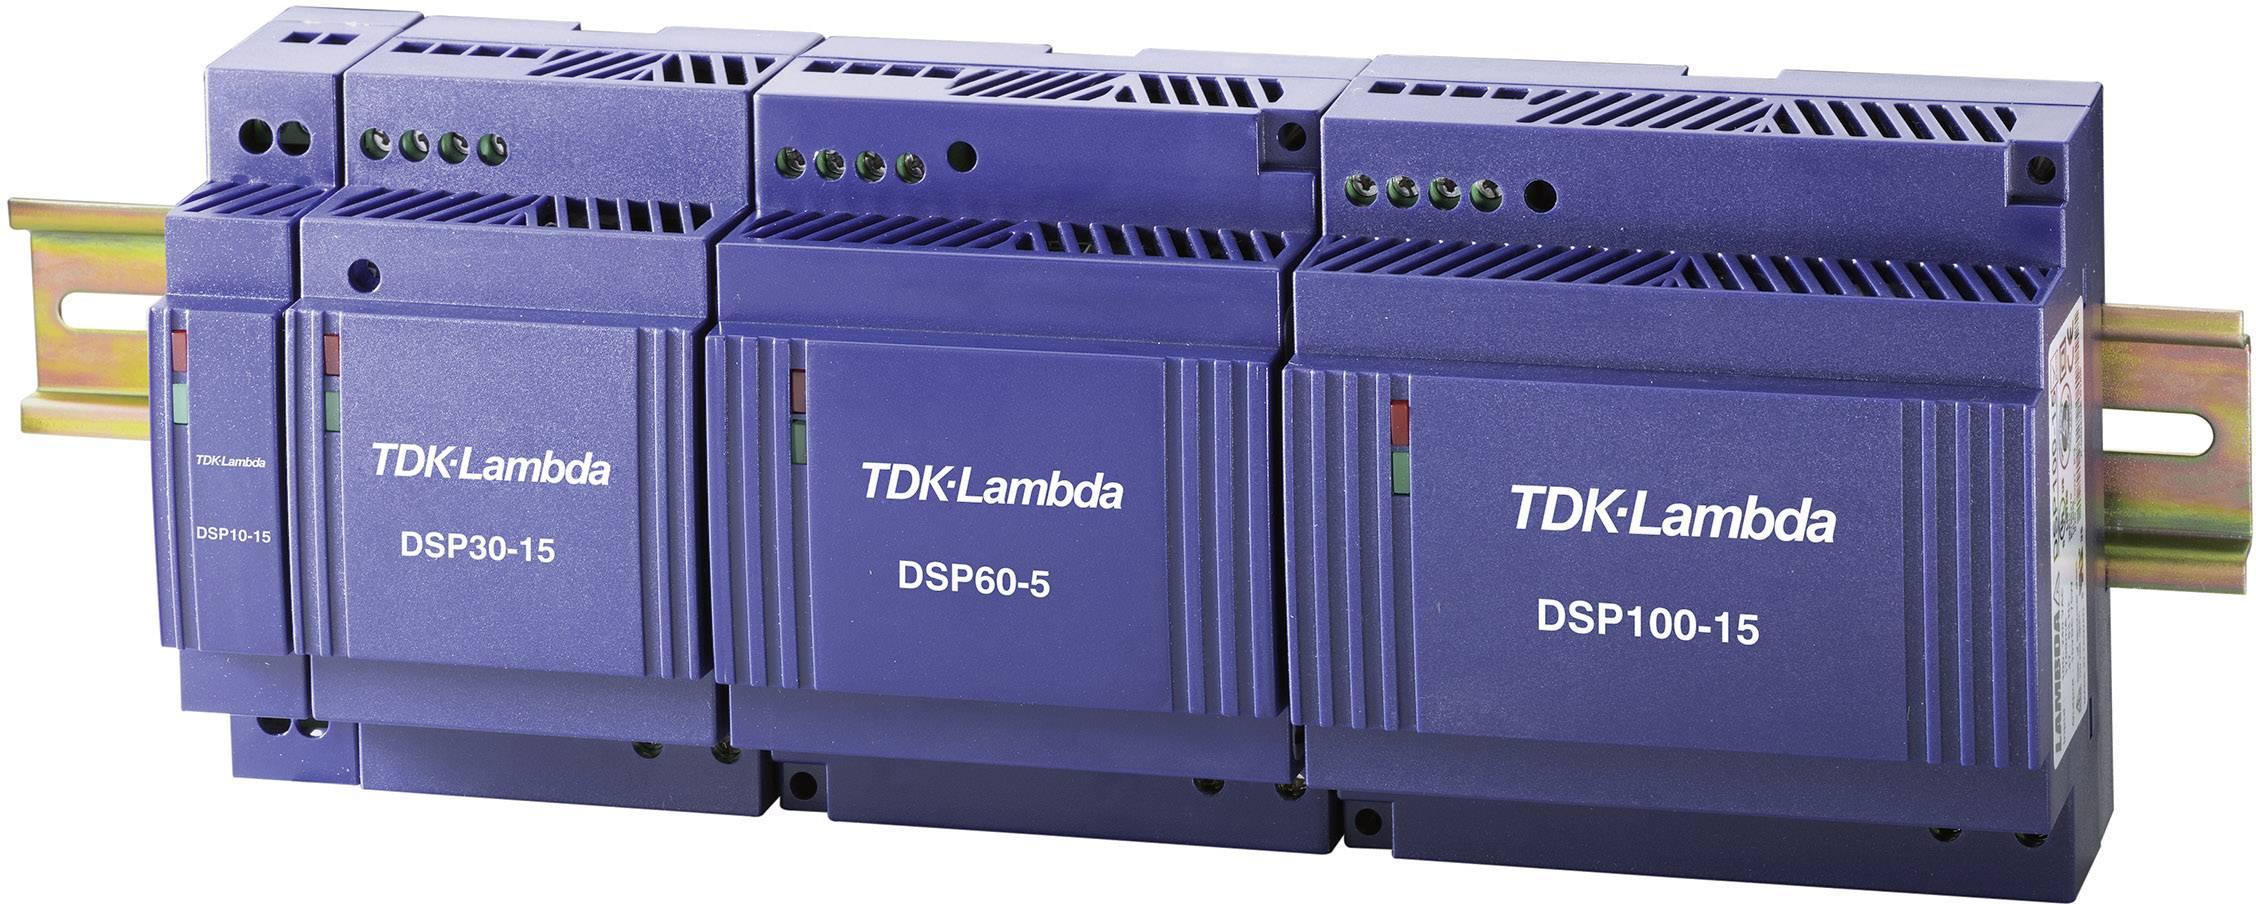 Sieťový zdroj na montážnu lištu (DIN lištu) TDK-Lambda DSP-60-24, 1 x, 24 V/DC, 2.5 A, 60 W